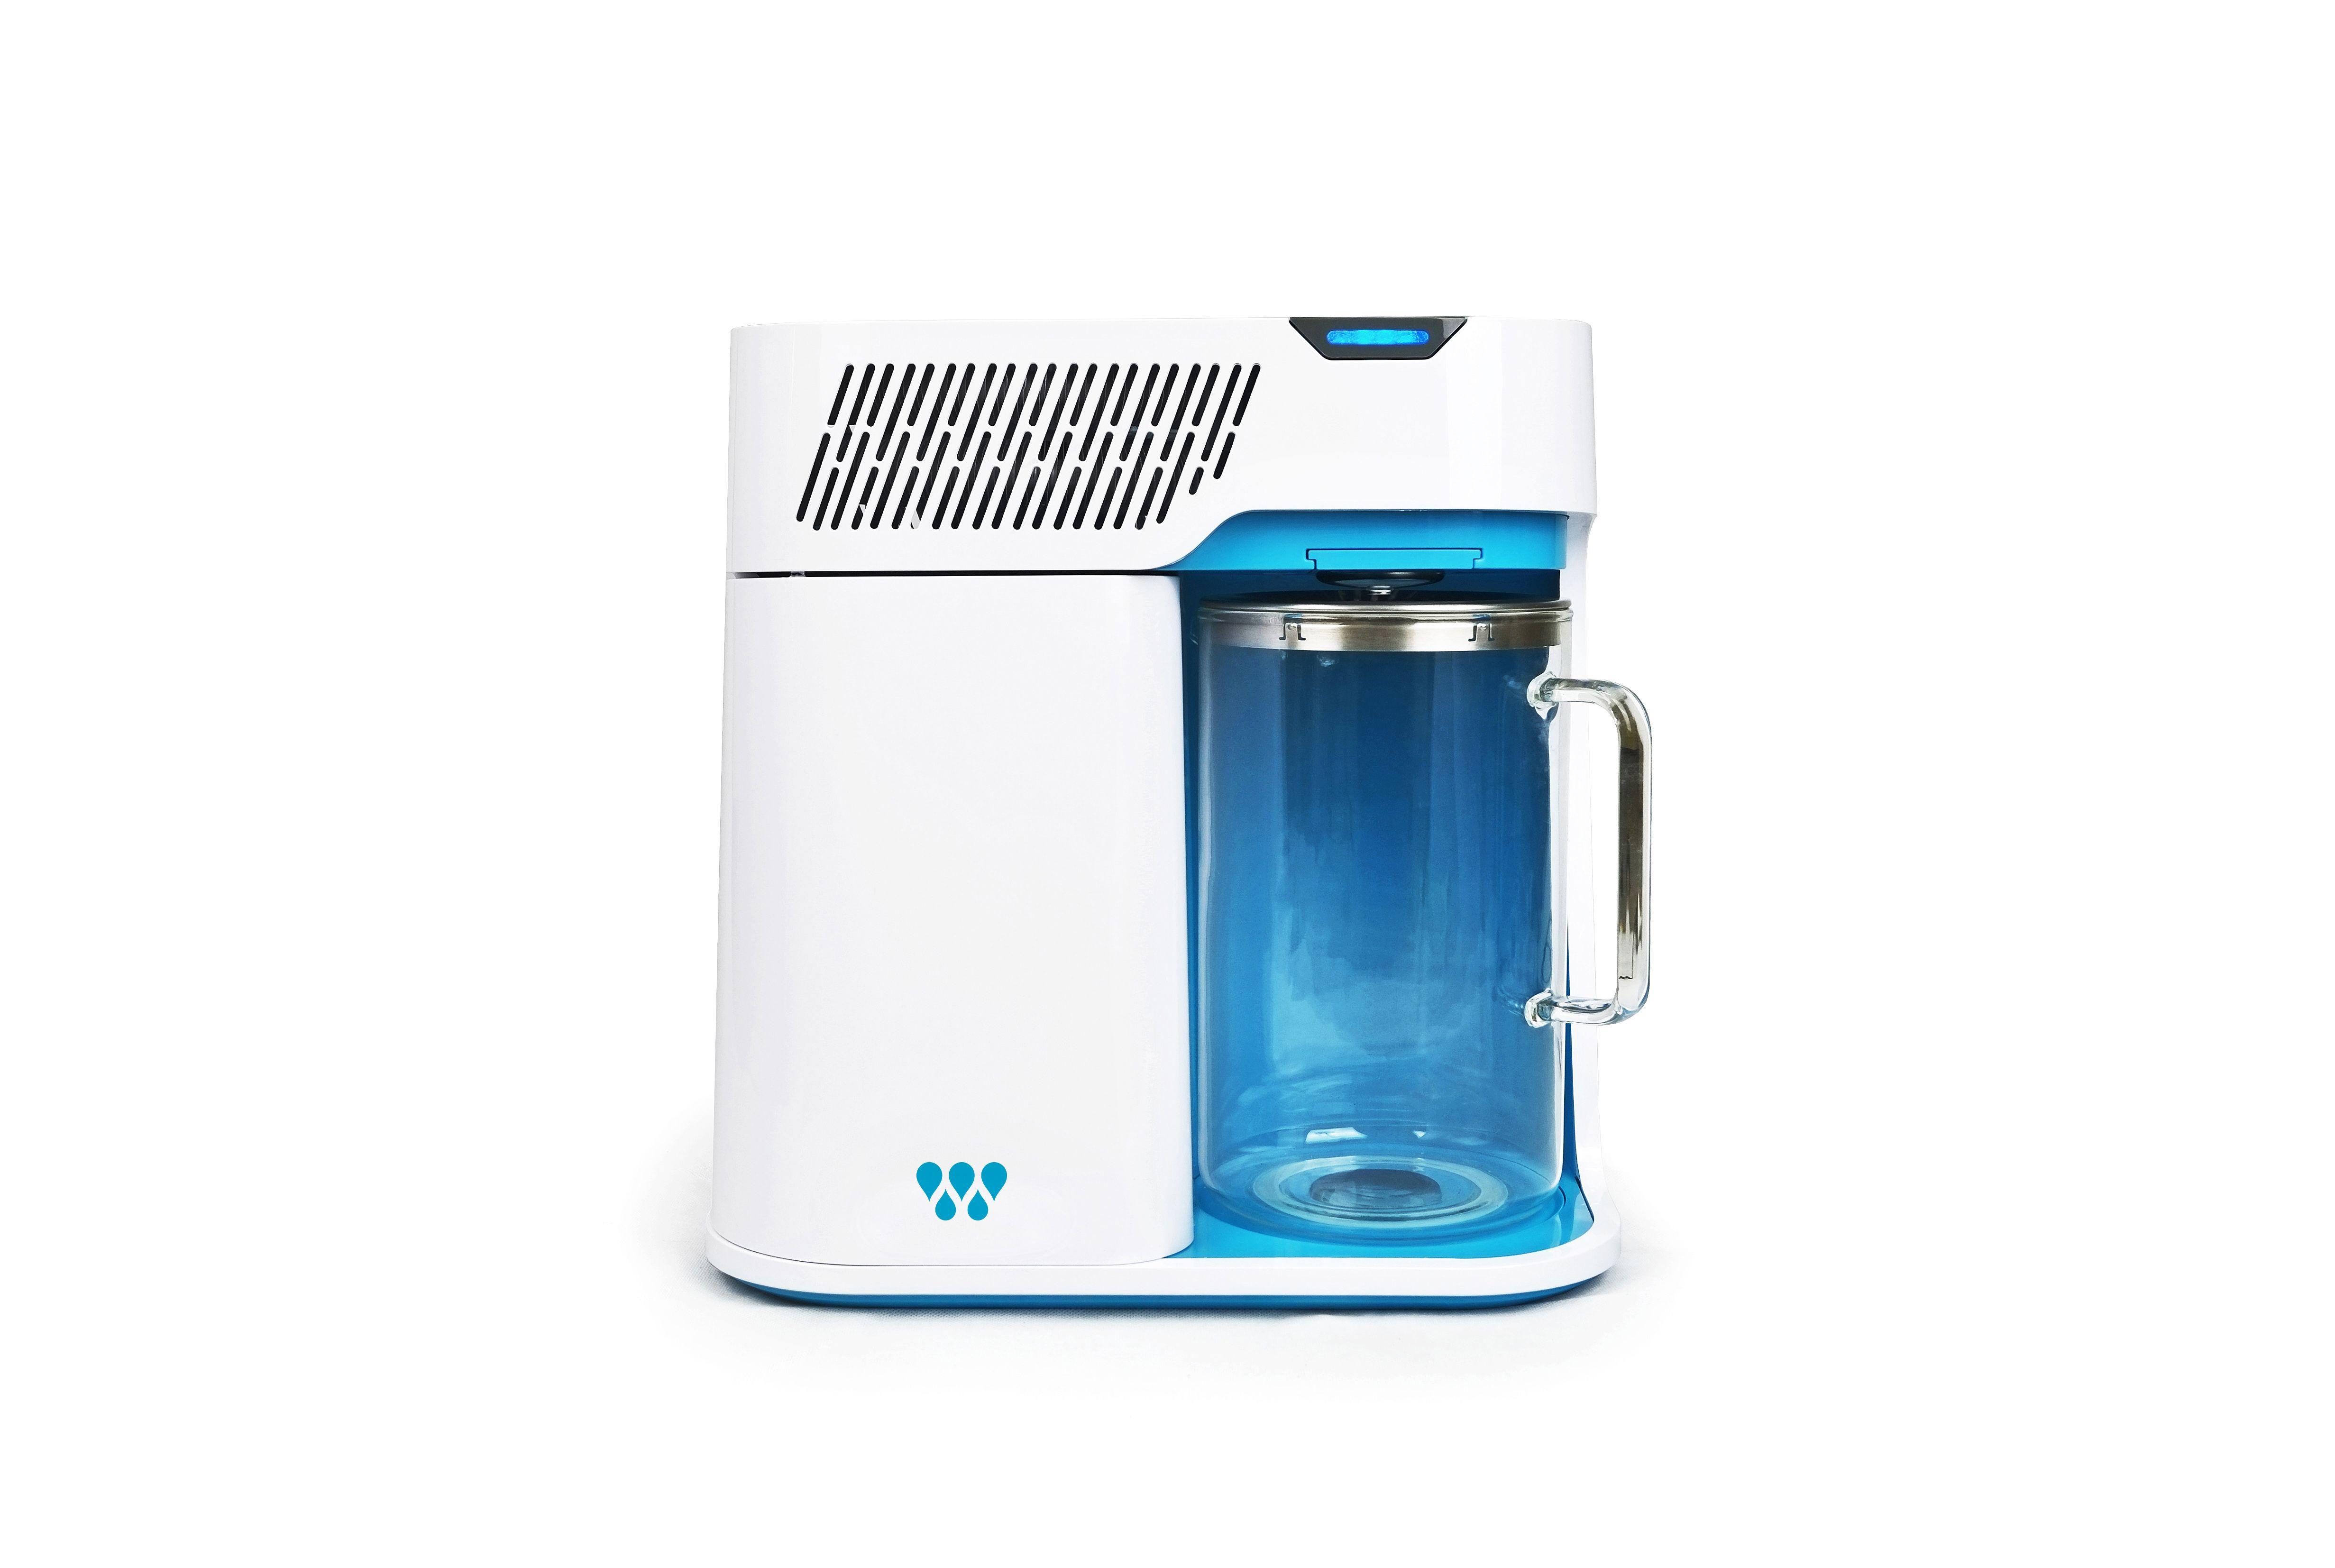 Waterlovers DW2800 water distiller http://www.alibaba.com/product ...